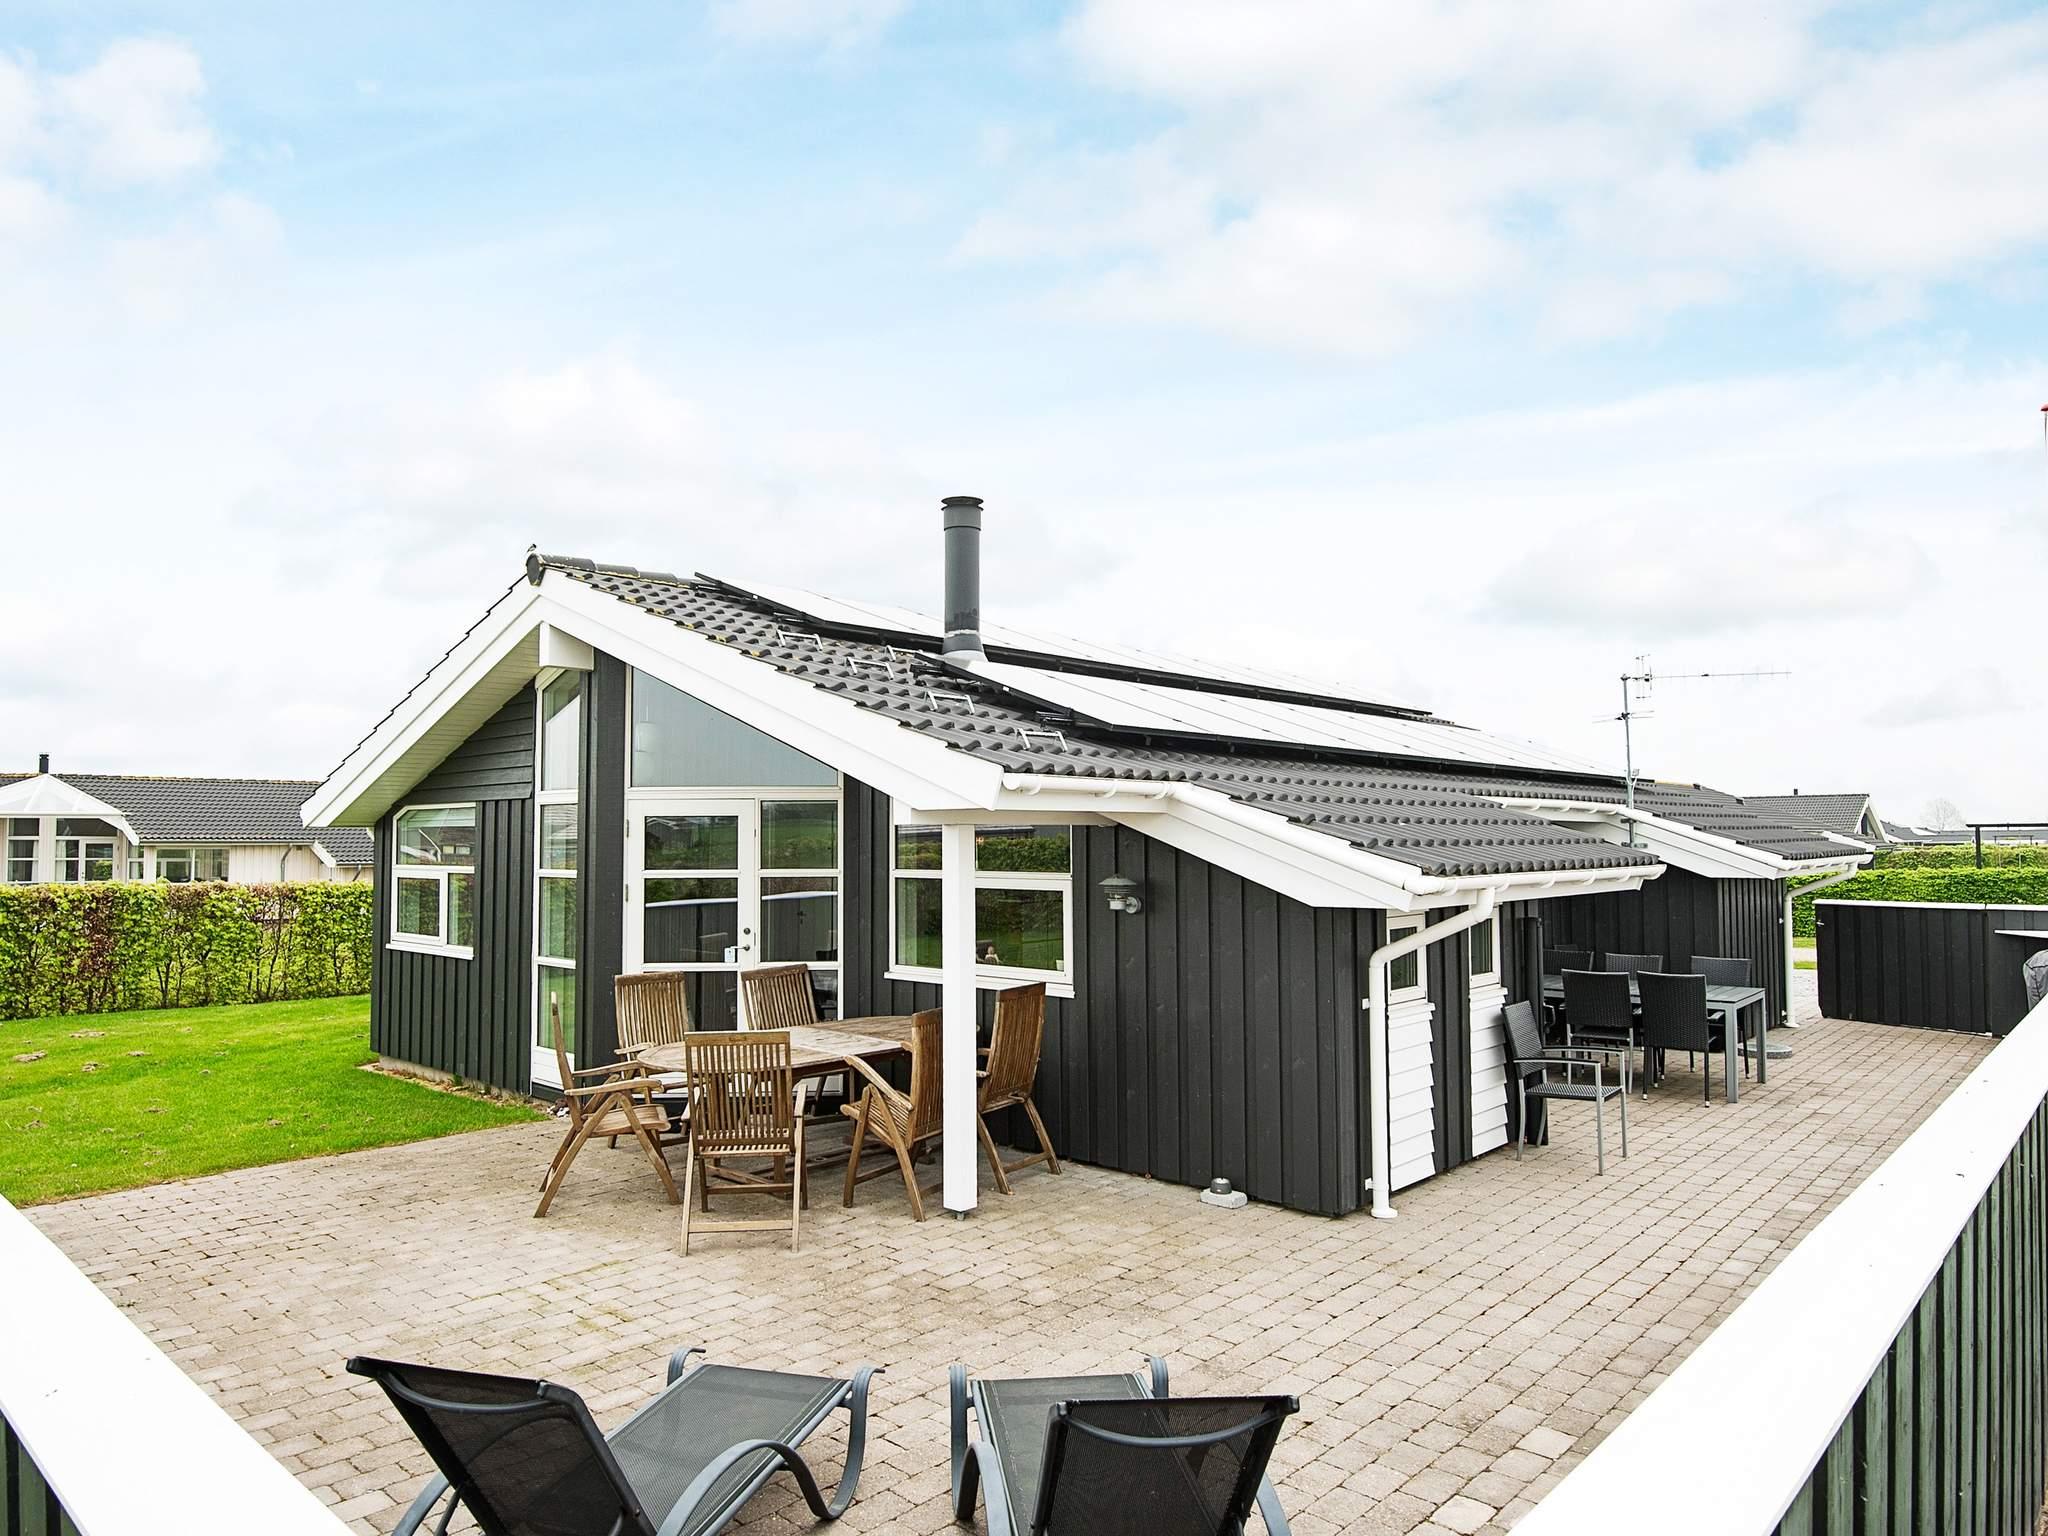 Ferienhaus Flovt Strand (379532), Flovt Strand, , Südostjütland, Dänemark, Bild 31